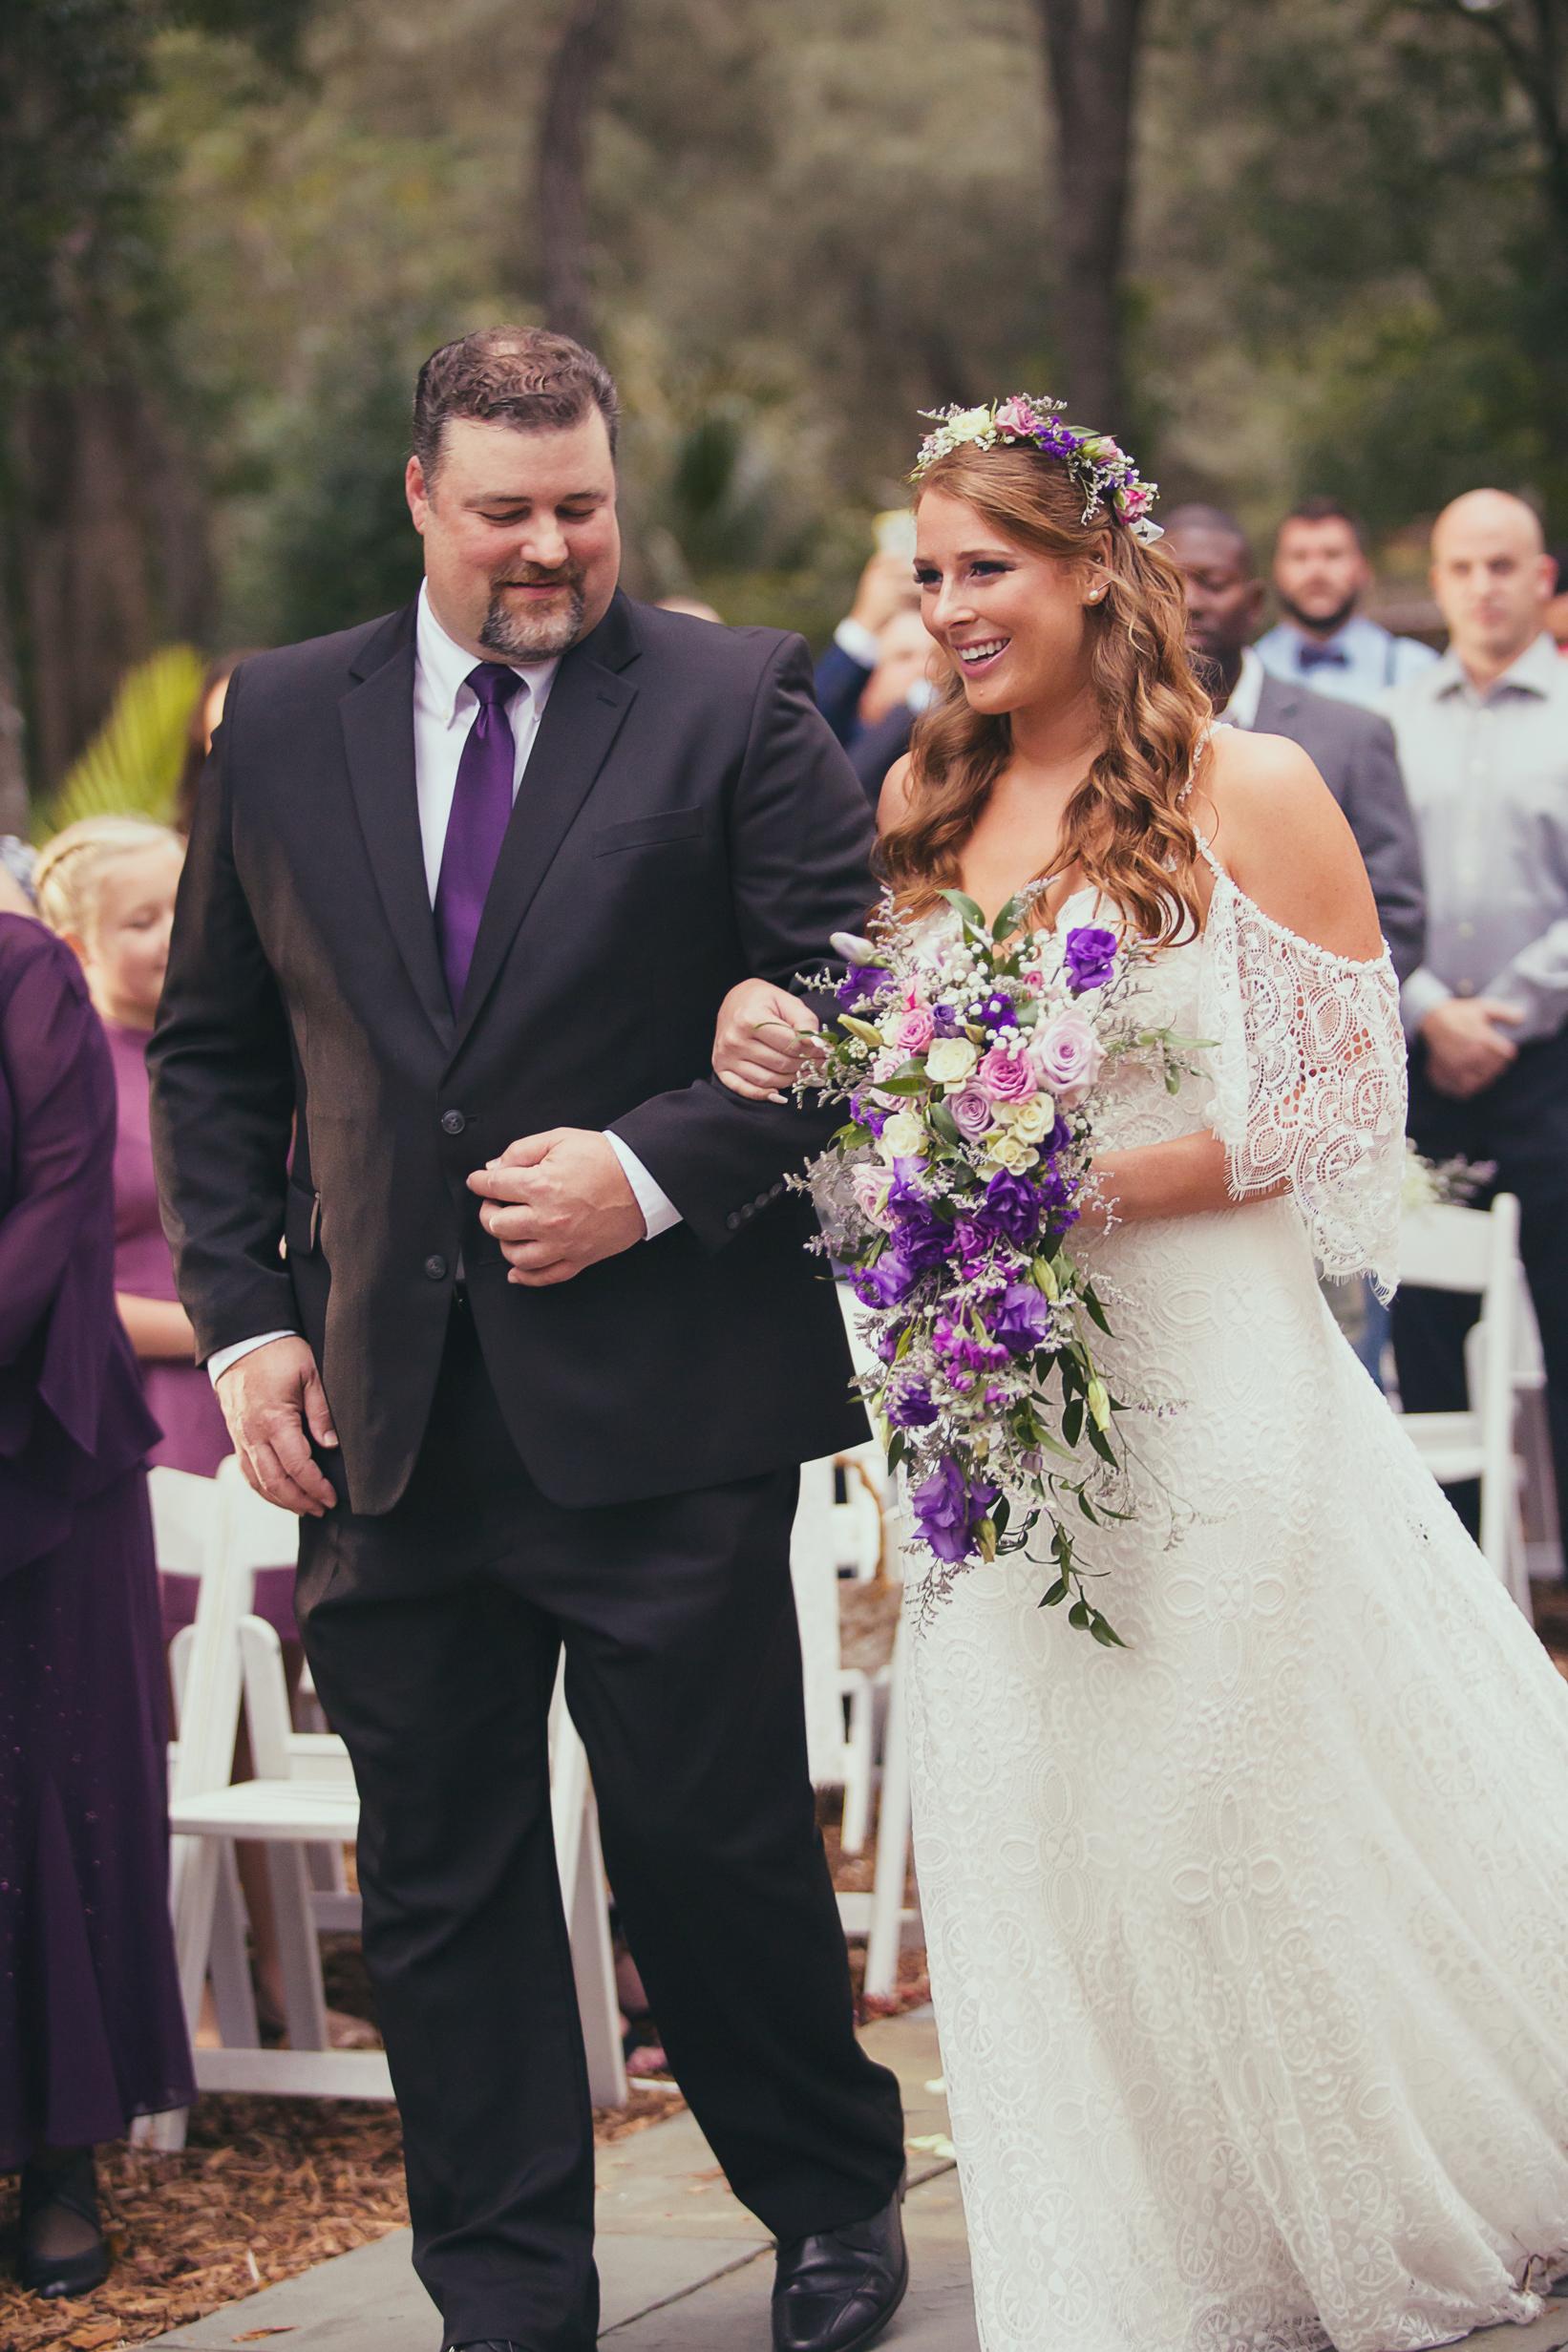 harmony-gardens-wedding-chamber-photography-moments-antoine-hart-4.jpg